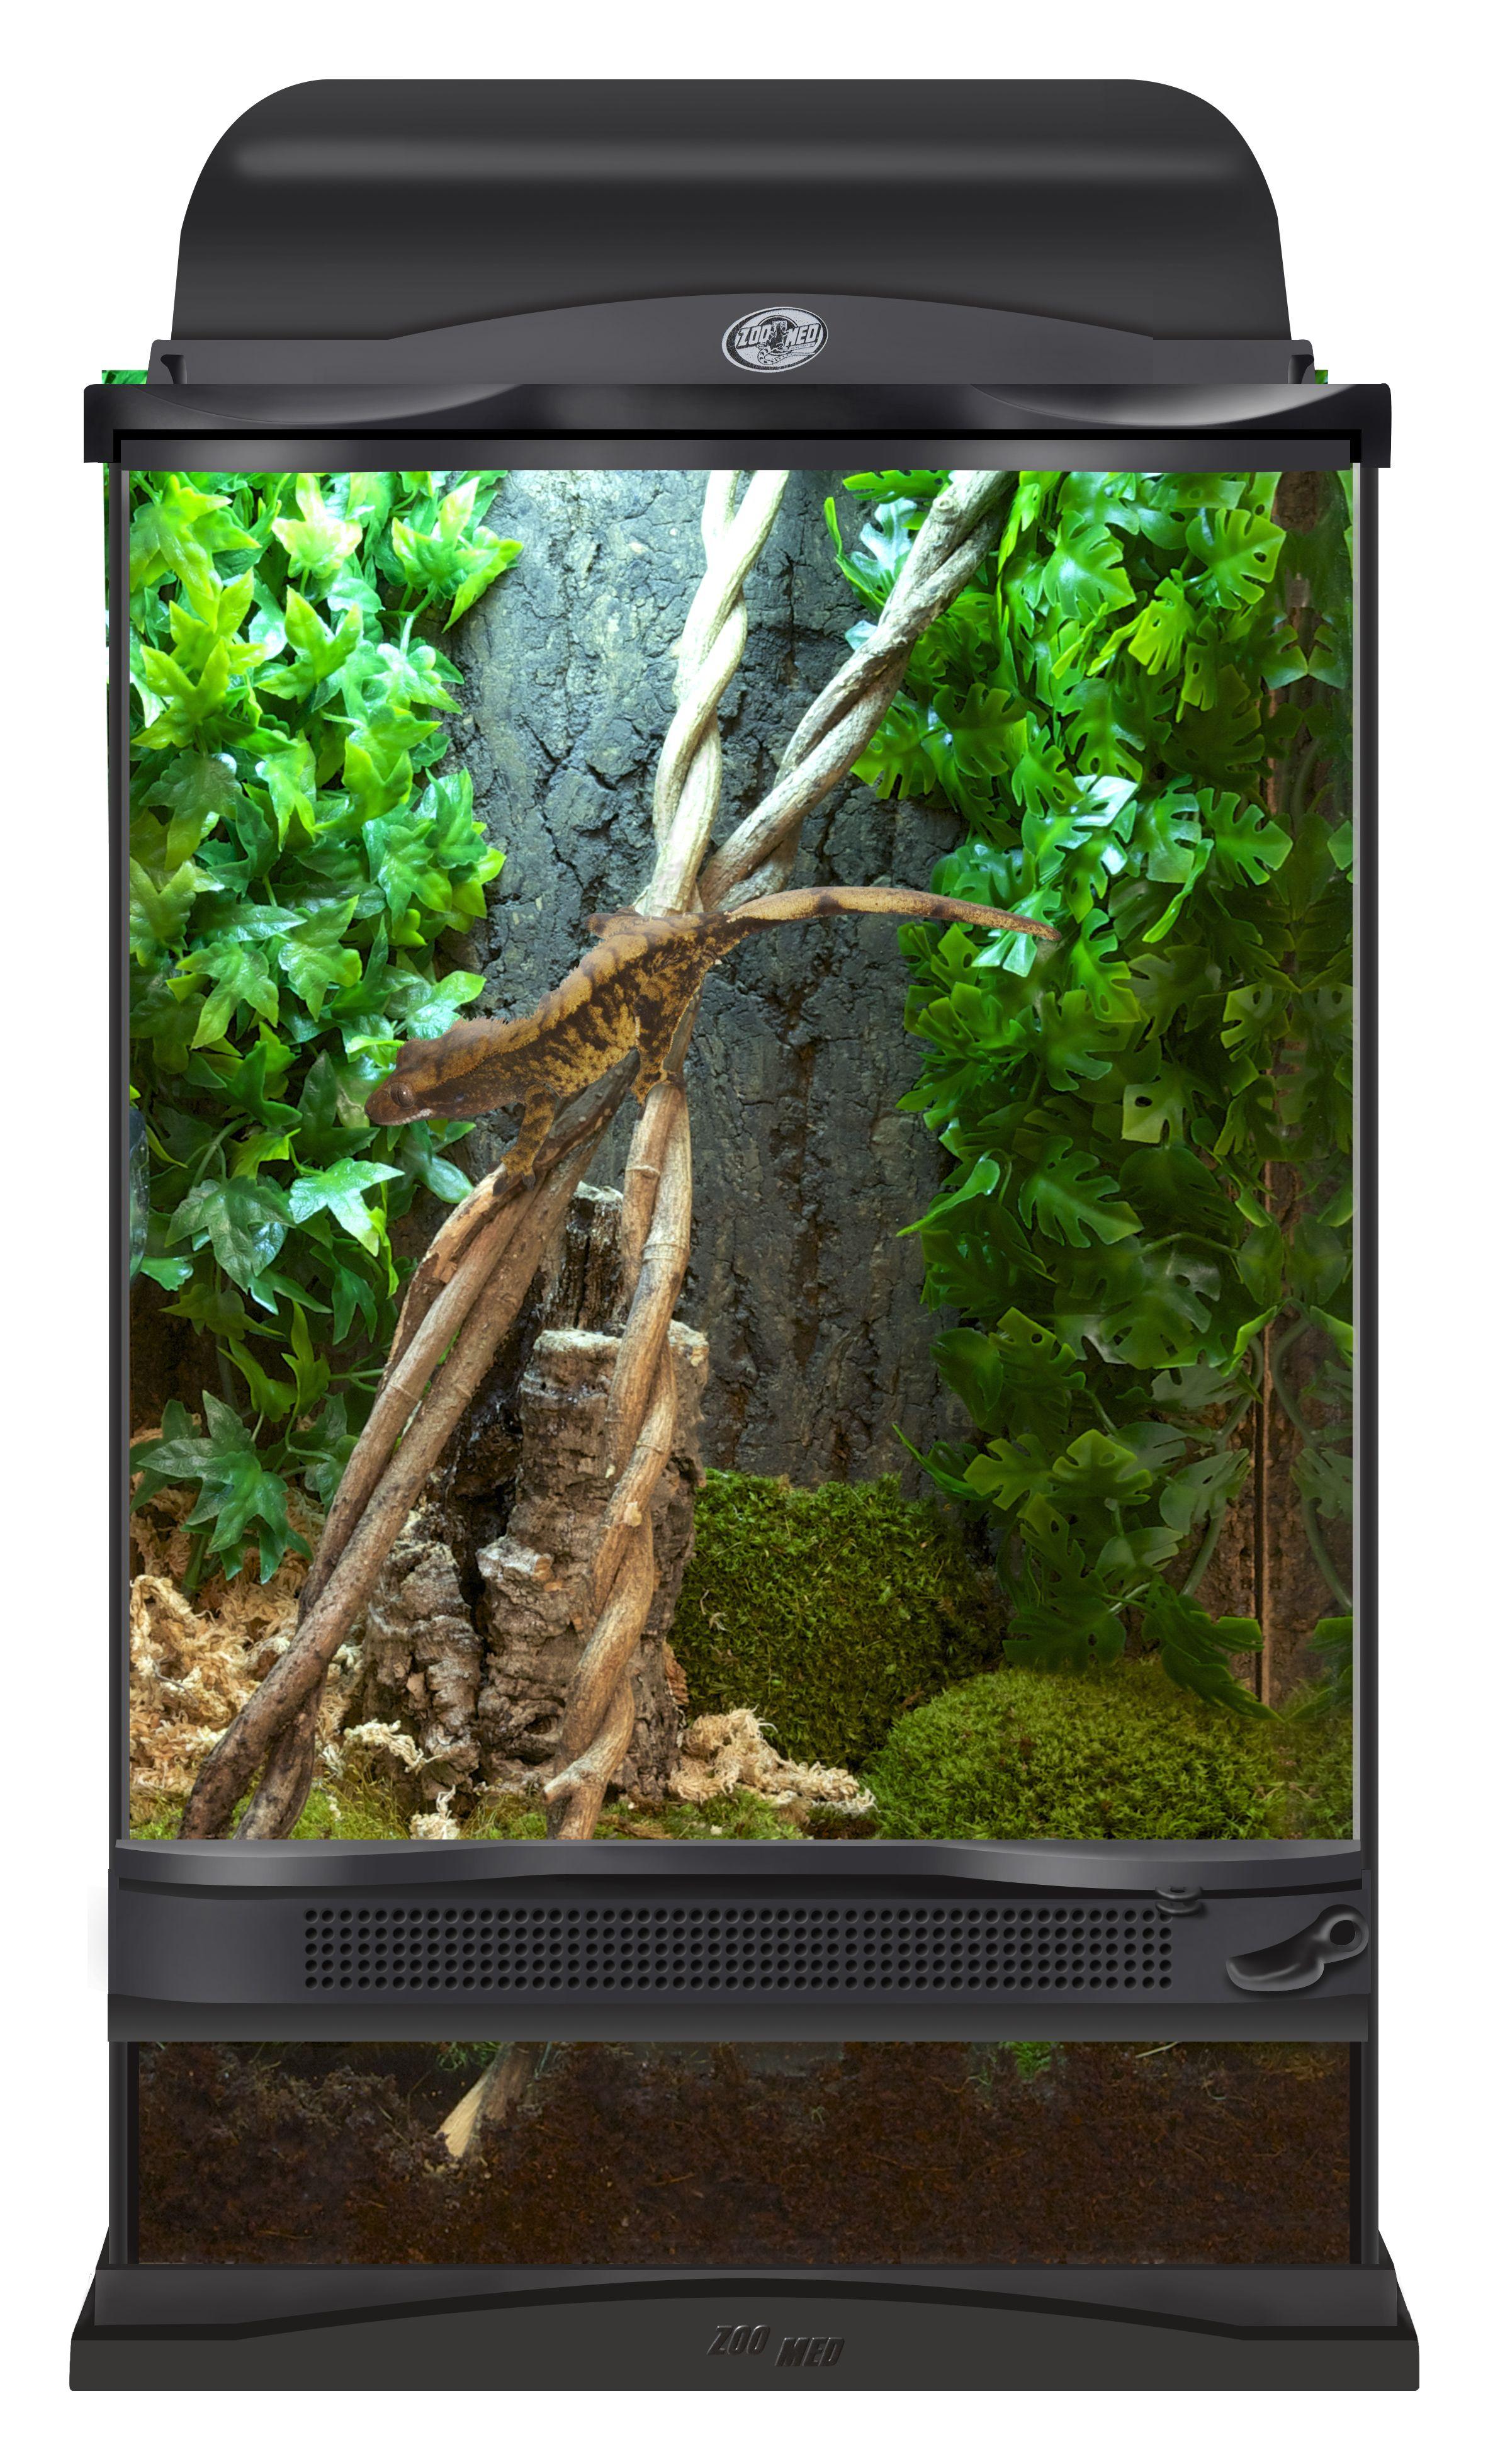 #1 In Reptile Products Worldwide Gecko Terrariumterrarium Ideasterrariumsvivariumcrested